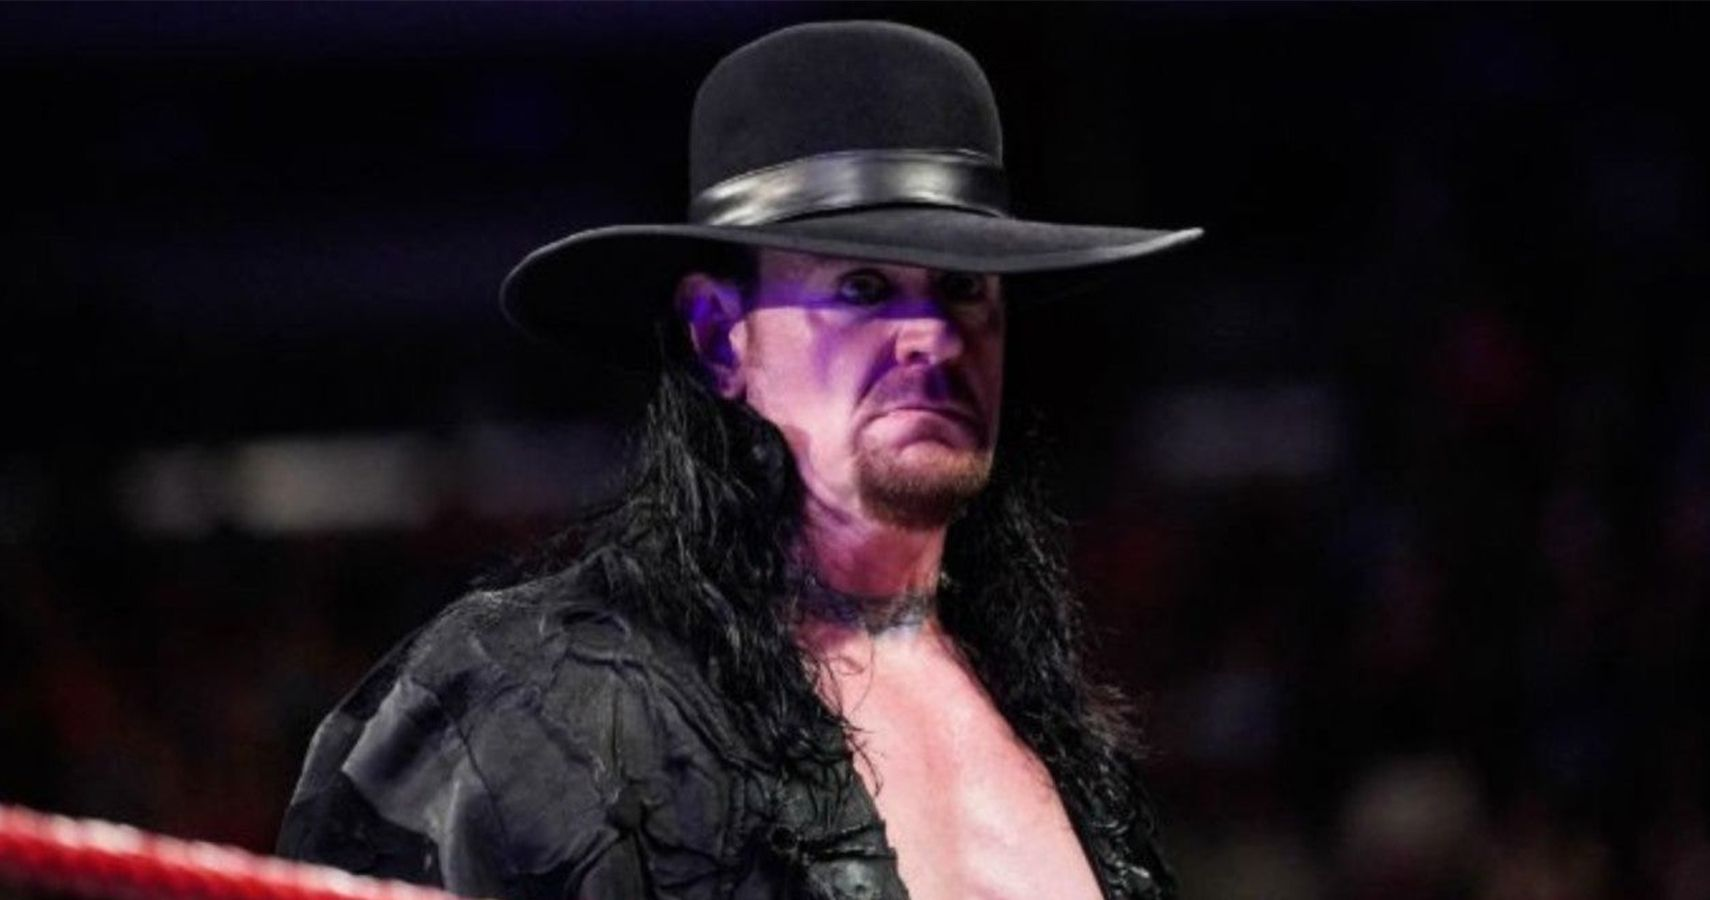 Untertaker